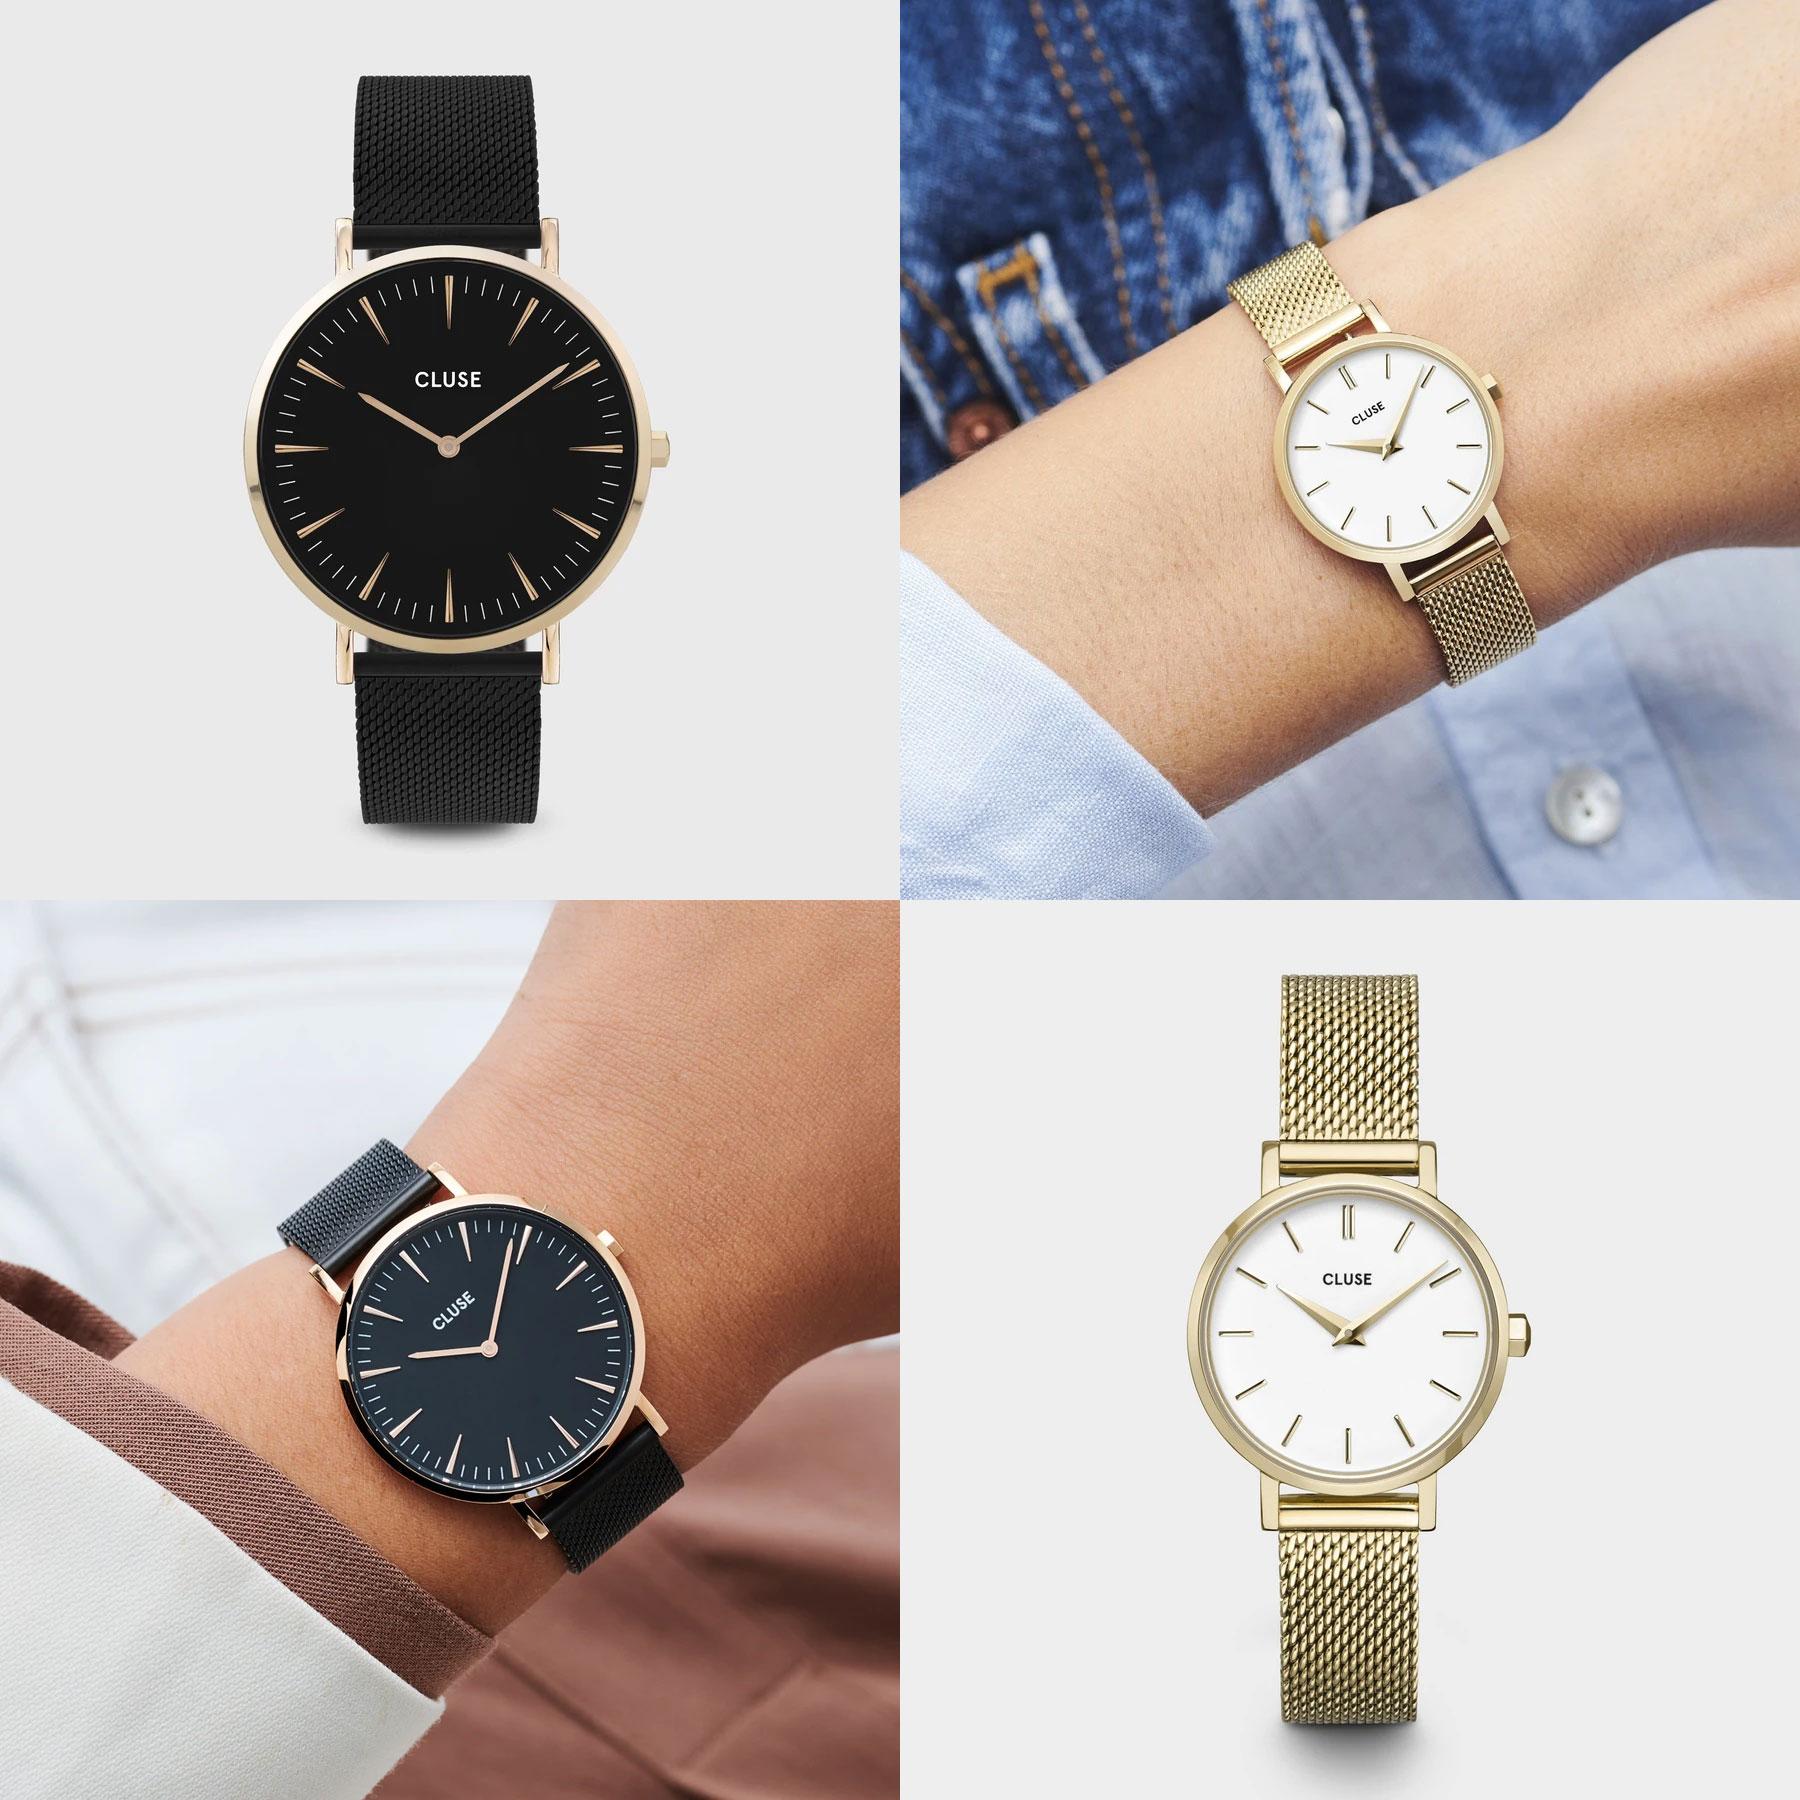 CLUSE horloges - 2 modellen - 20% extra korting